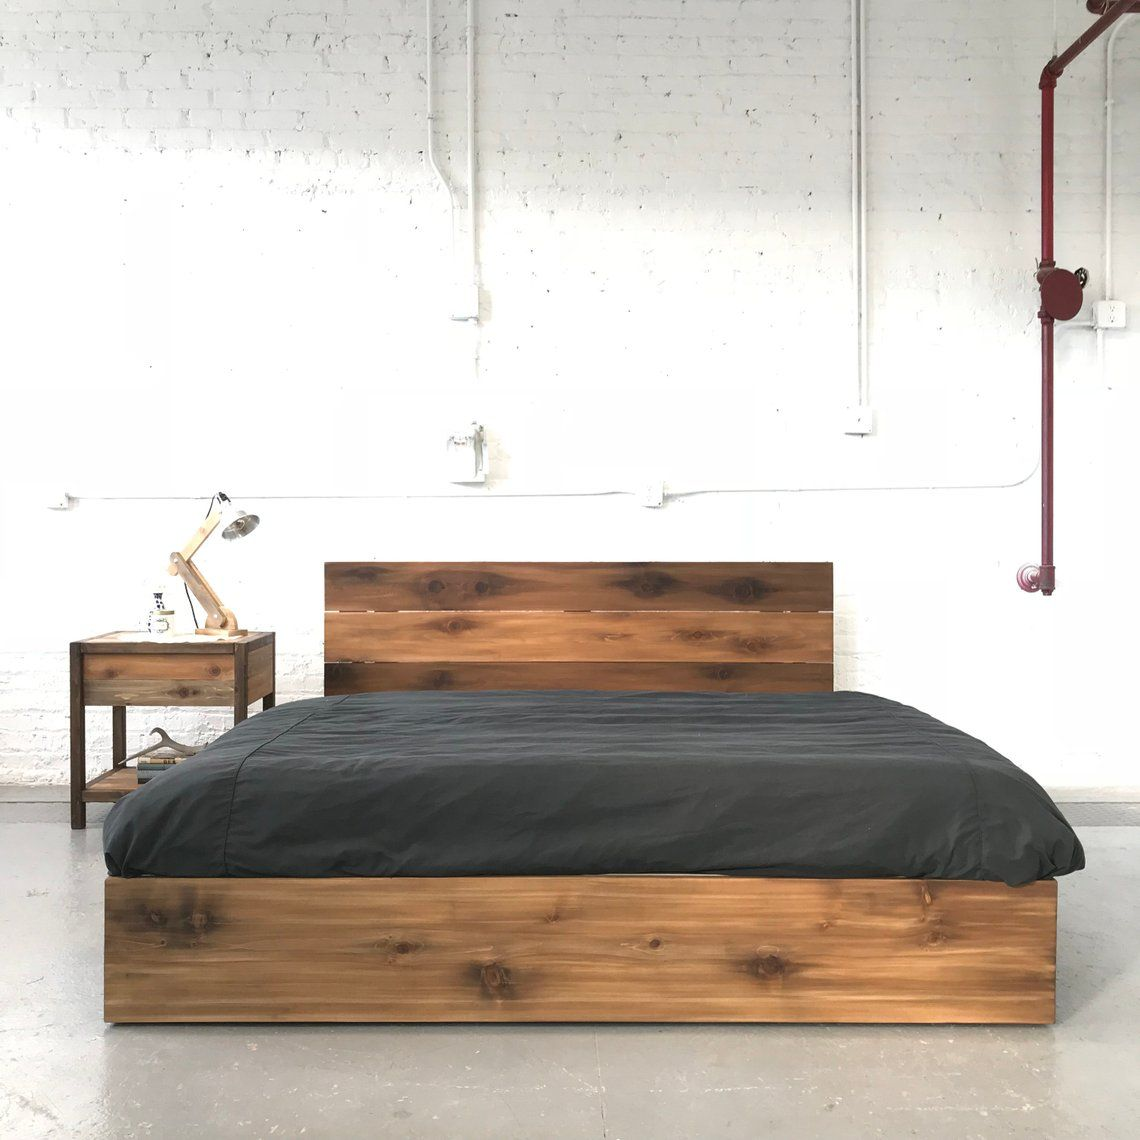 The Butte Platform Loft Style Solid Wood Handmade In Usa Loft Style Solid Wood Home Decor